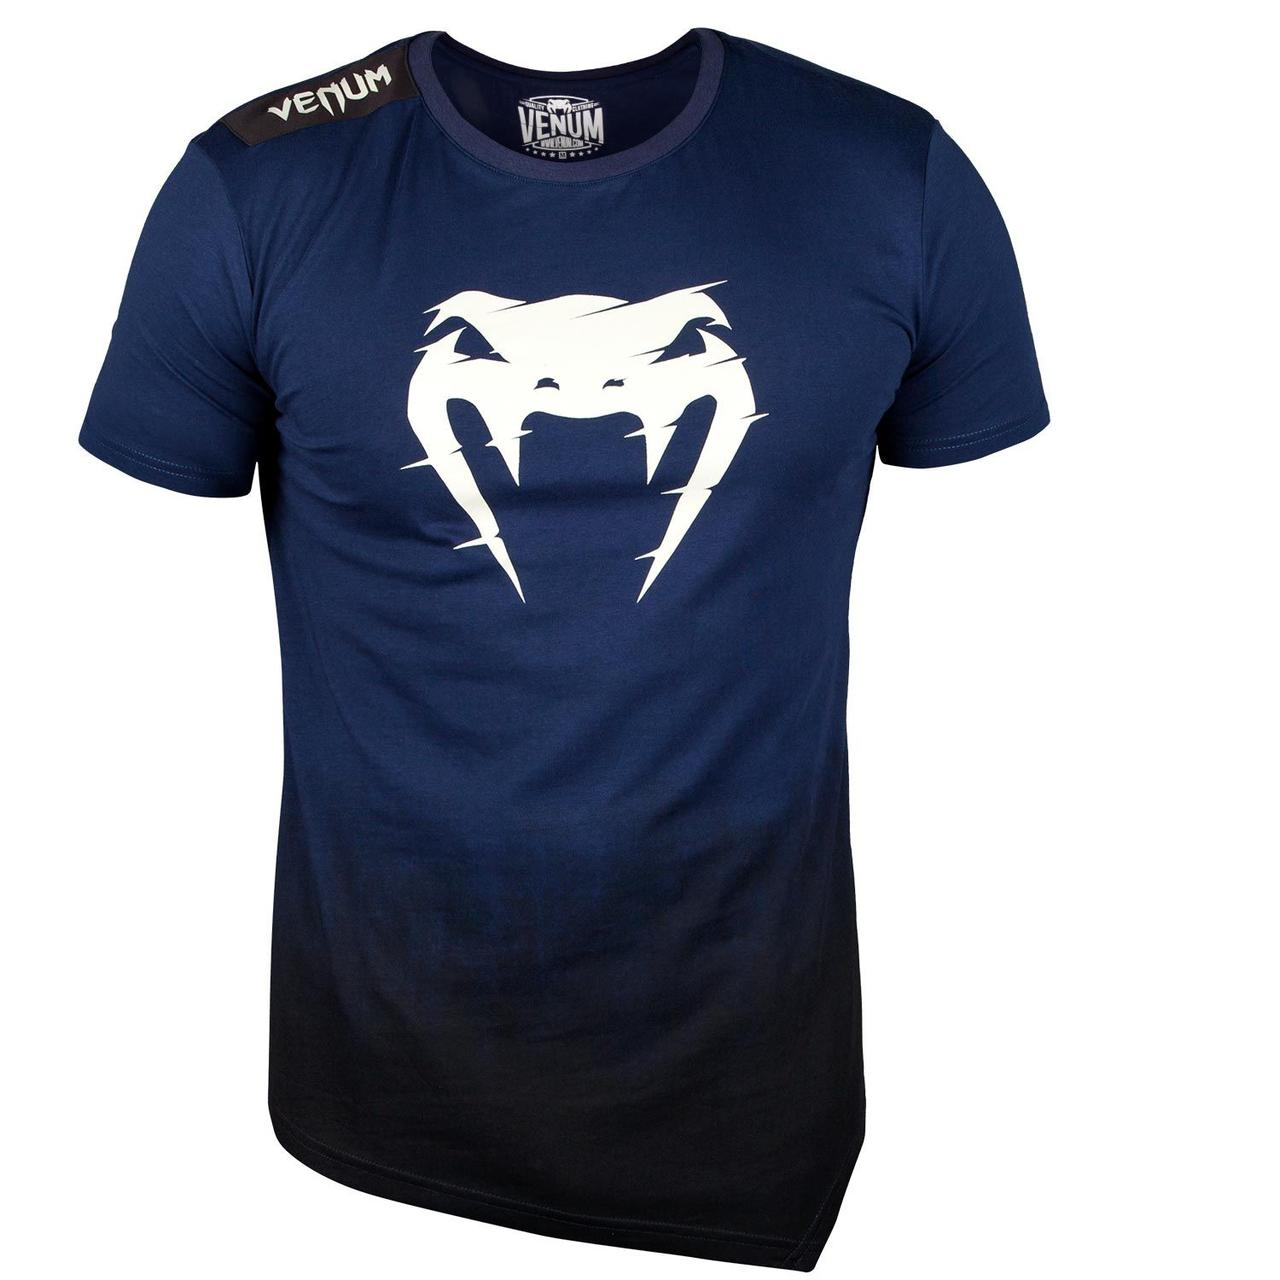 Футболка Venum Interference 2.0 T-shirt Blue